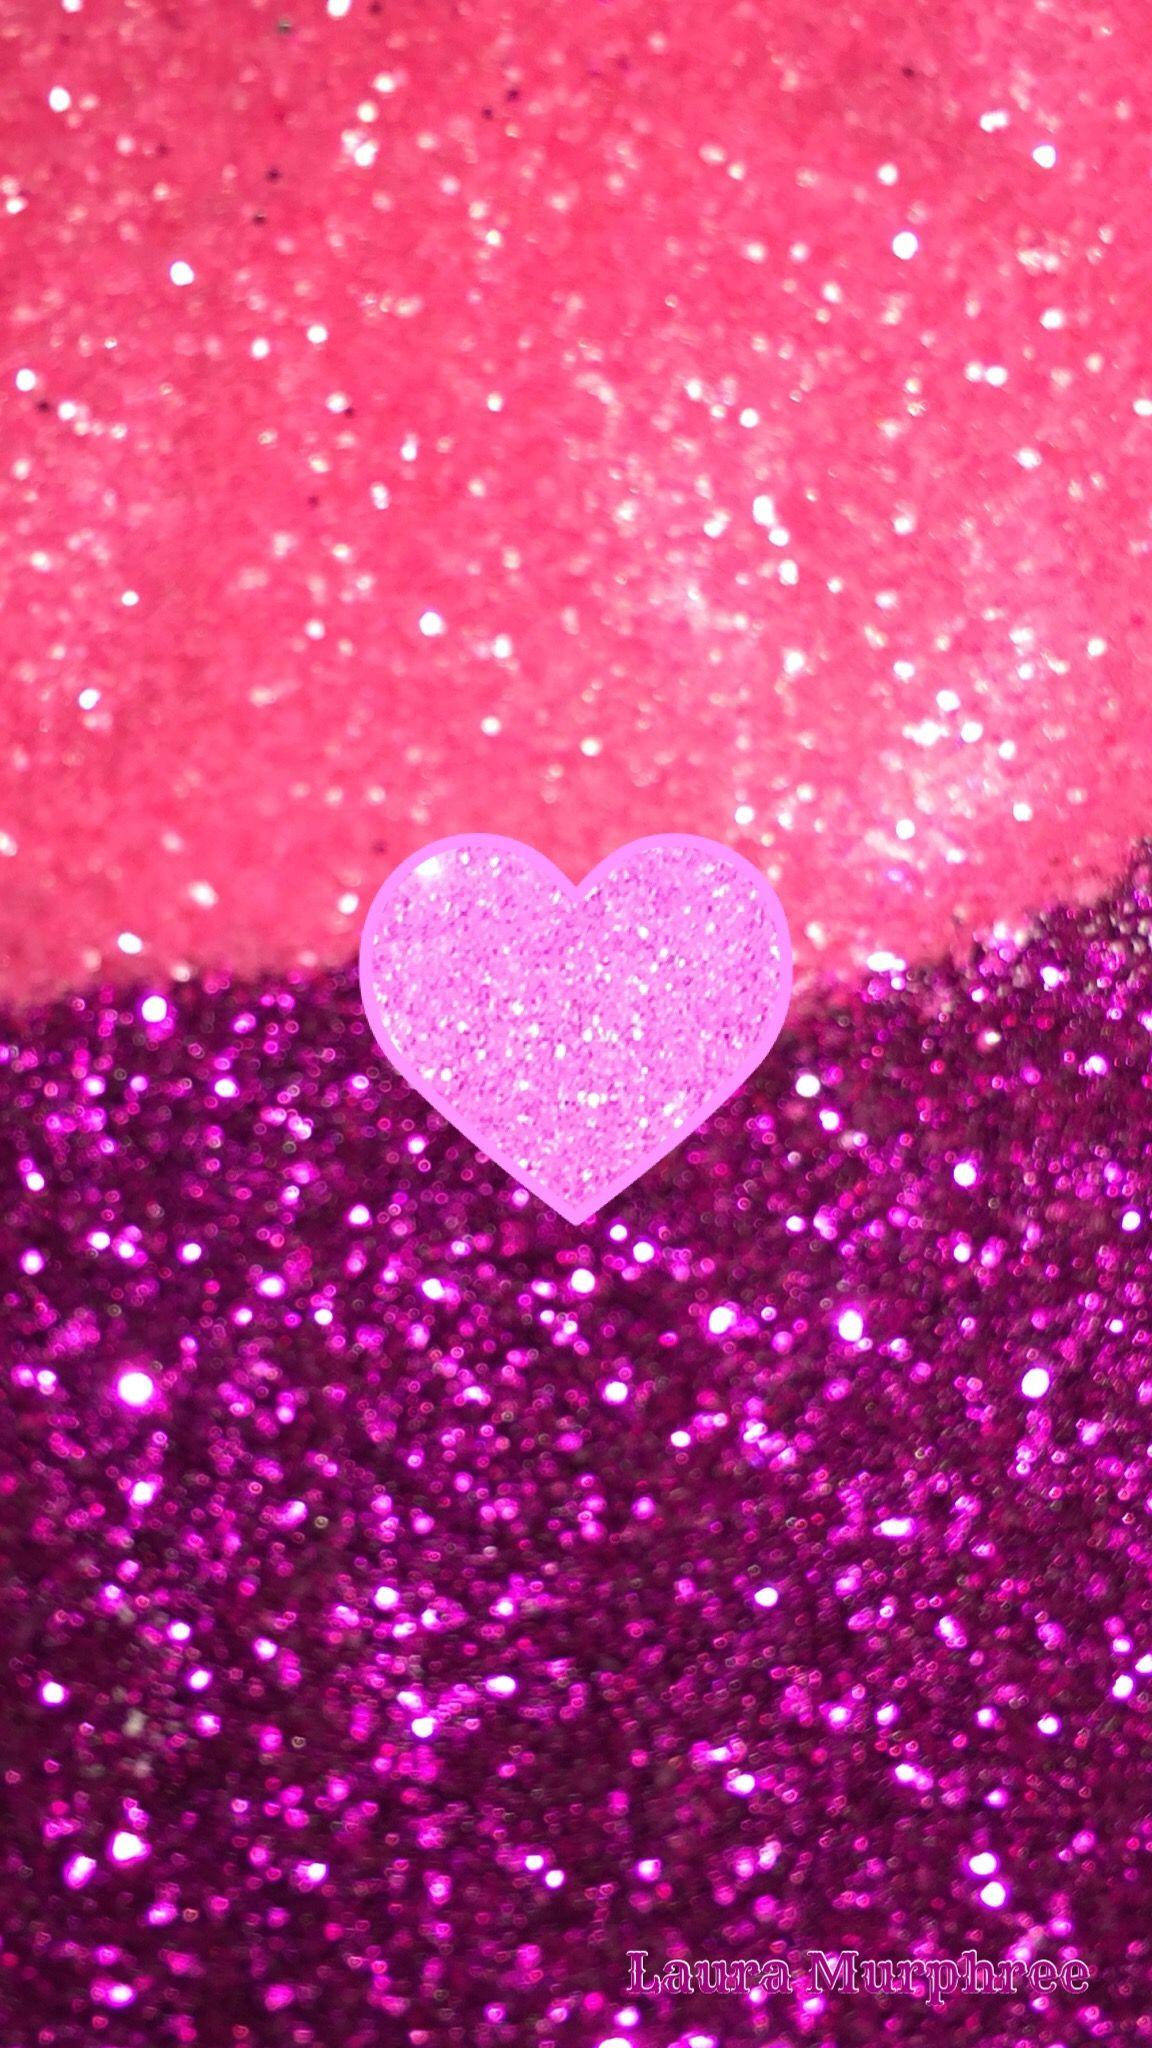 Glitter Phone Wallpaper Sparkle Background Sparkling Bling Shimmer Sparkles Glitter Glittery Pink Wallpaper Iphone Glitter Phone Wallpaper Sparkles Background